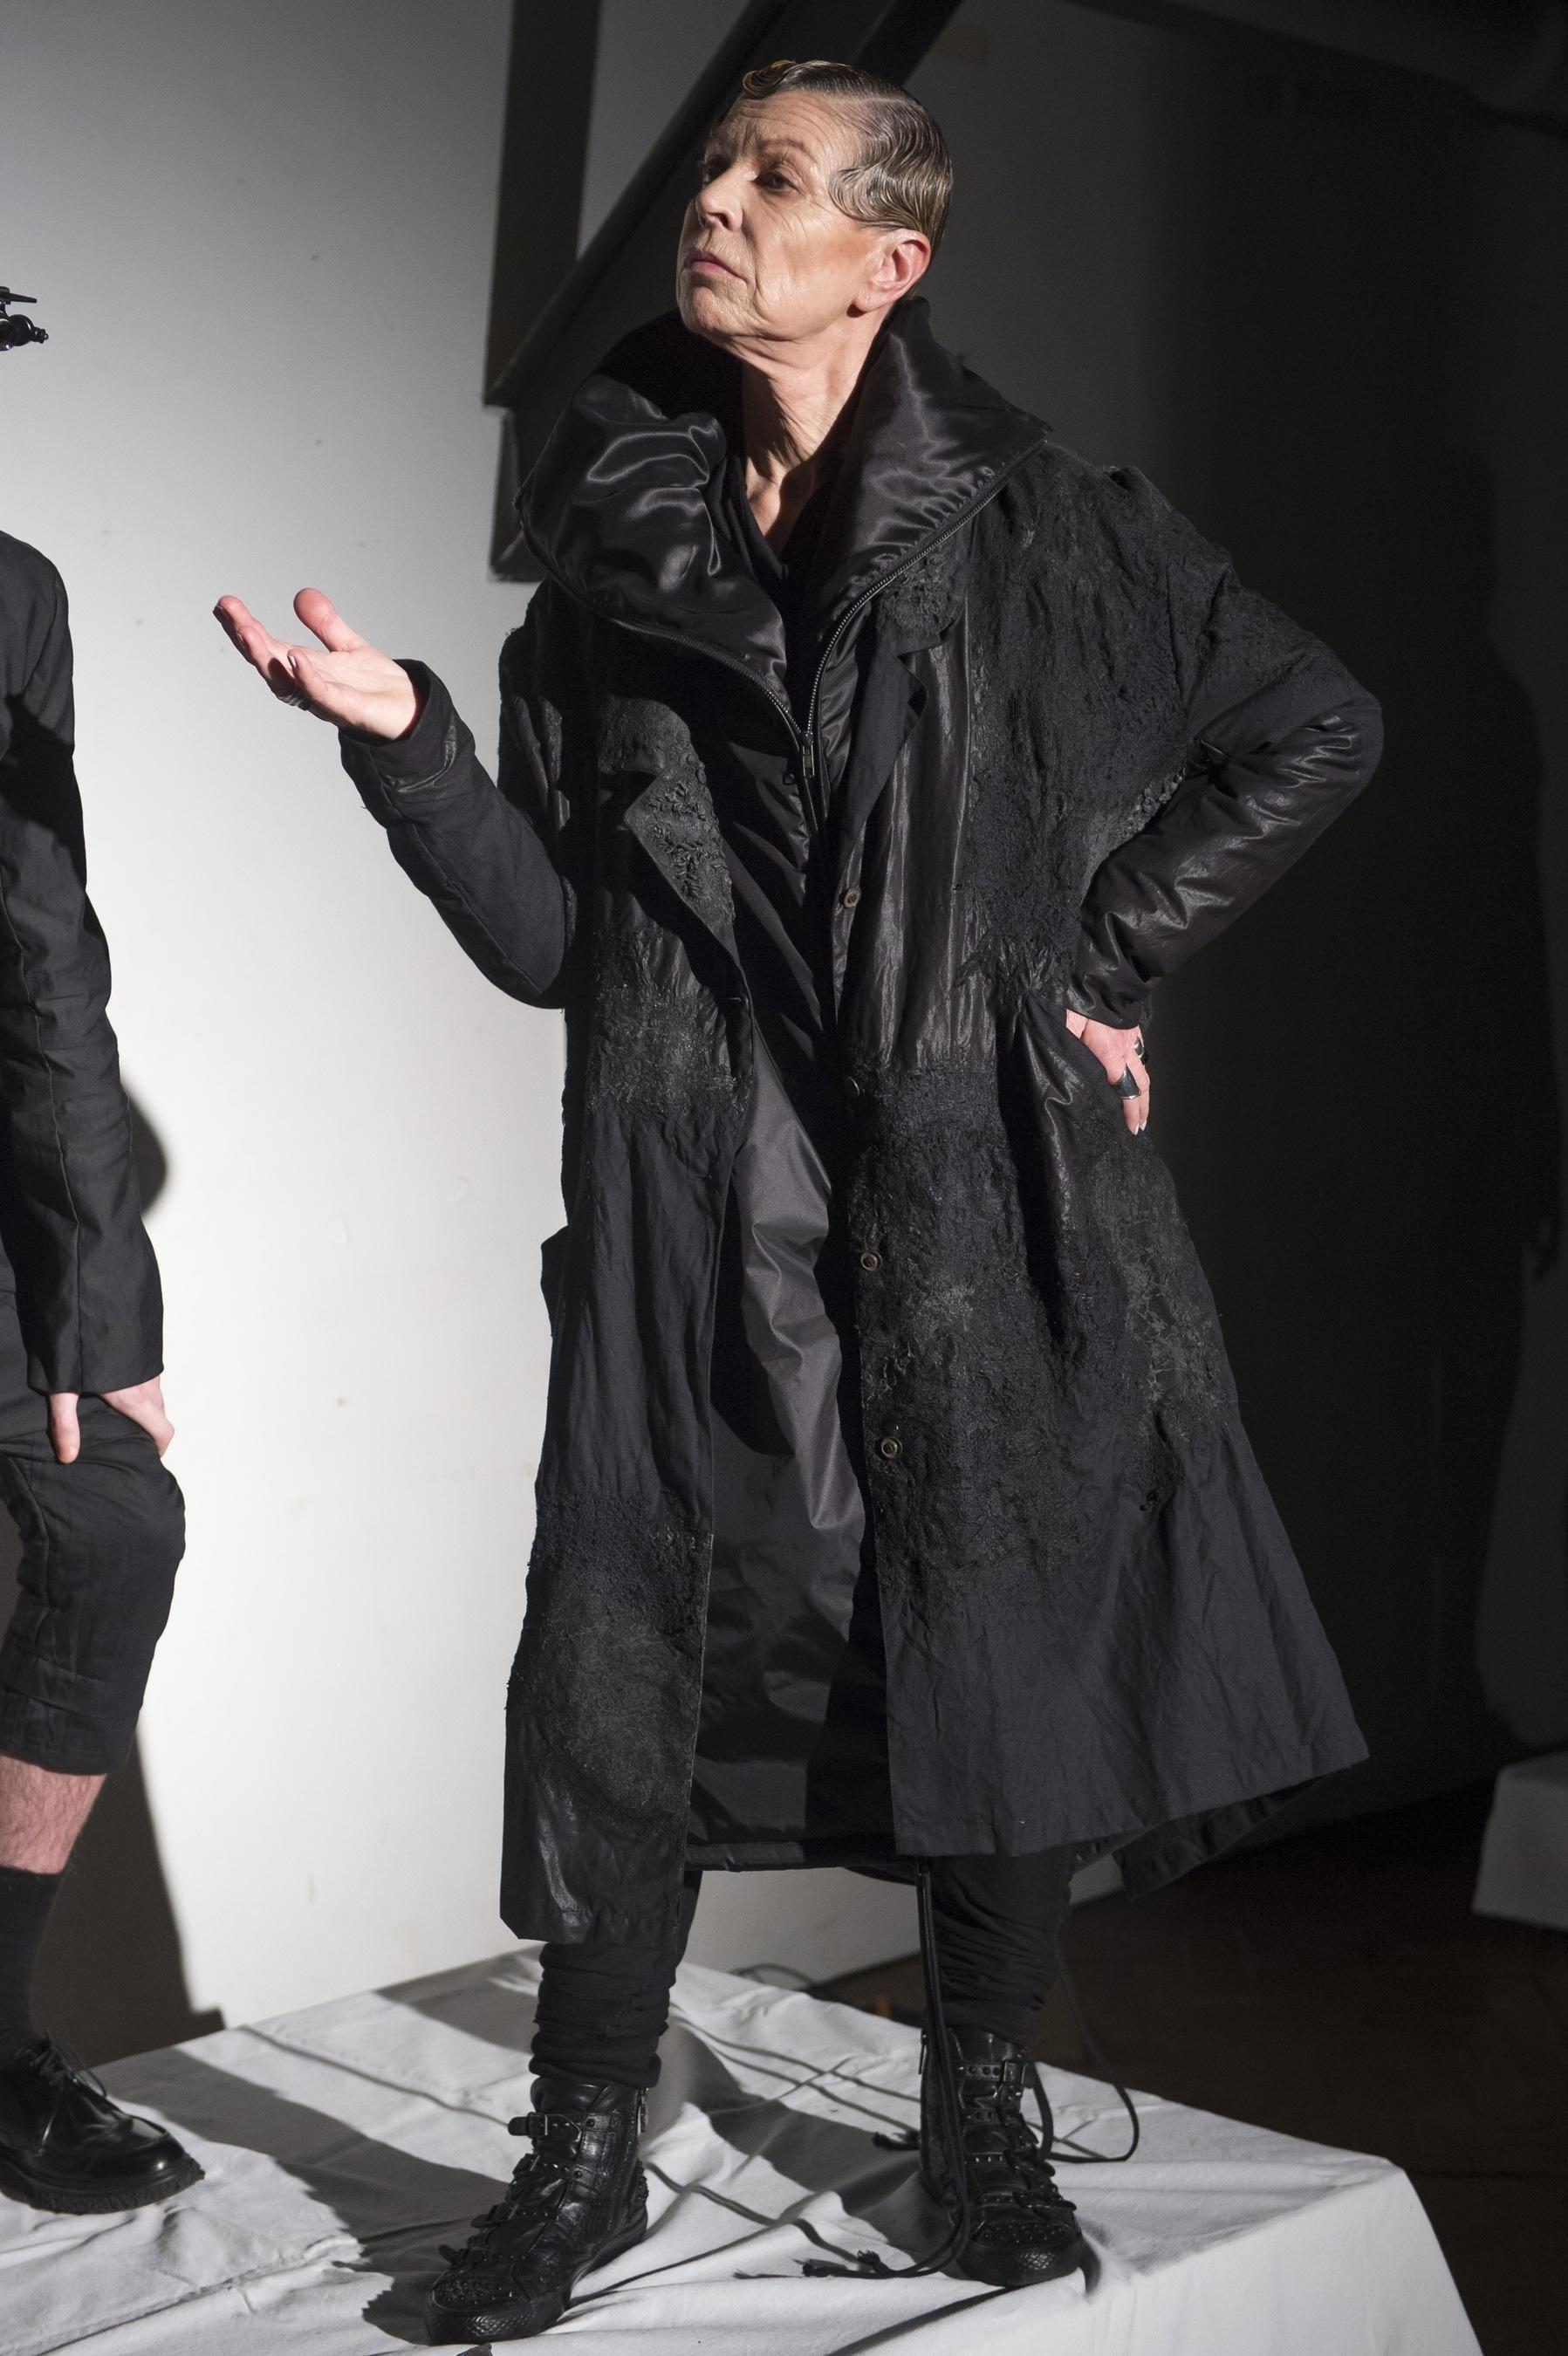 Défilé Sandrine Philippe Automne-hiver 2018-2019 Homme - Madame Figaro 8f9046bfcaeb